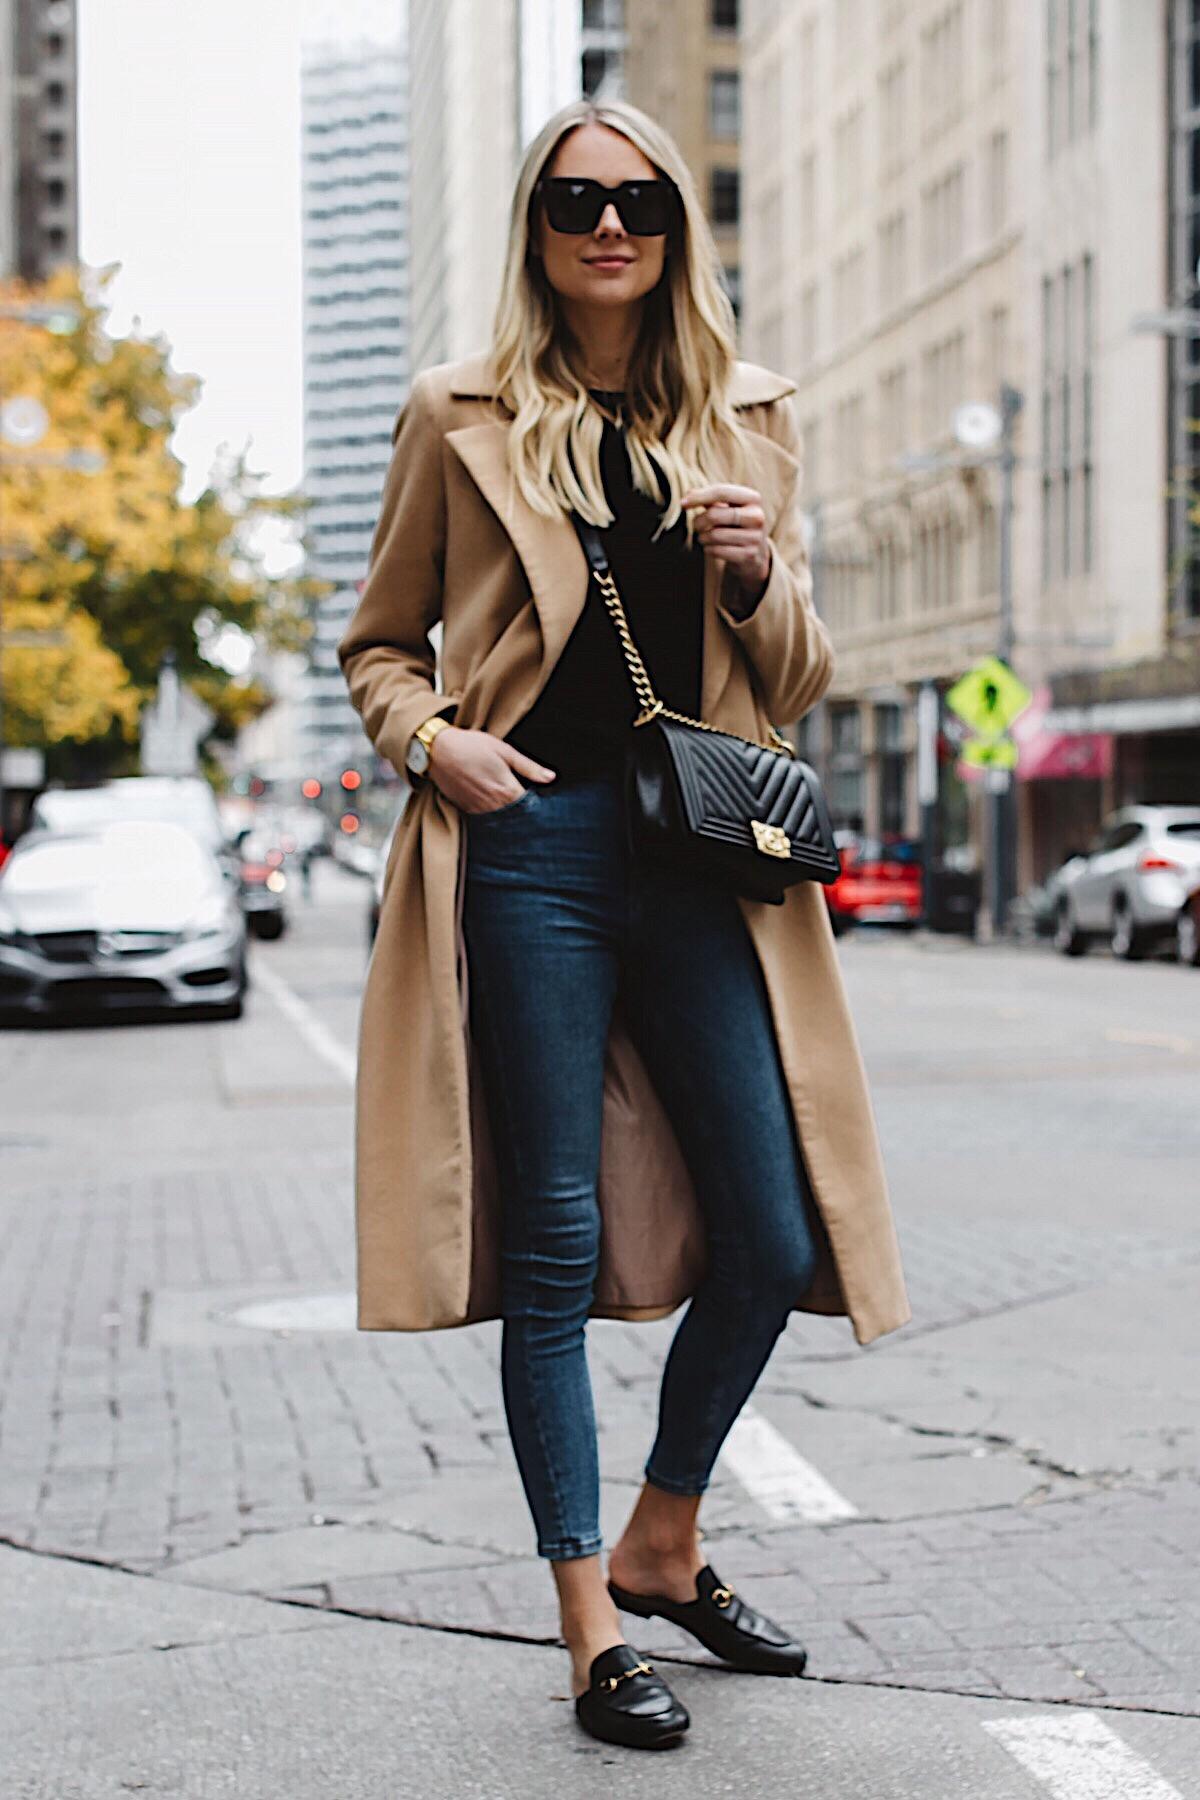 Blonde Woman Wearing Long Camel Coat Black Sweater Topshop Denim Skinny Jeans Gucci Mules Chanel